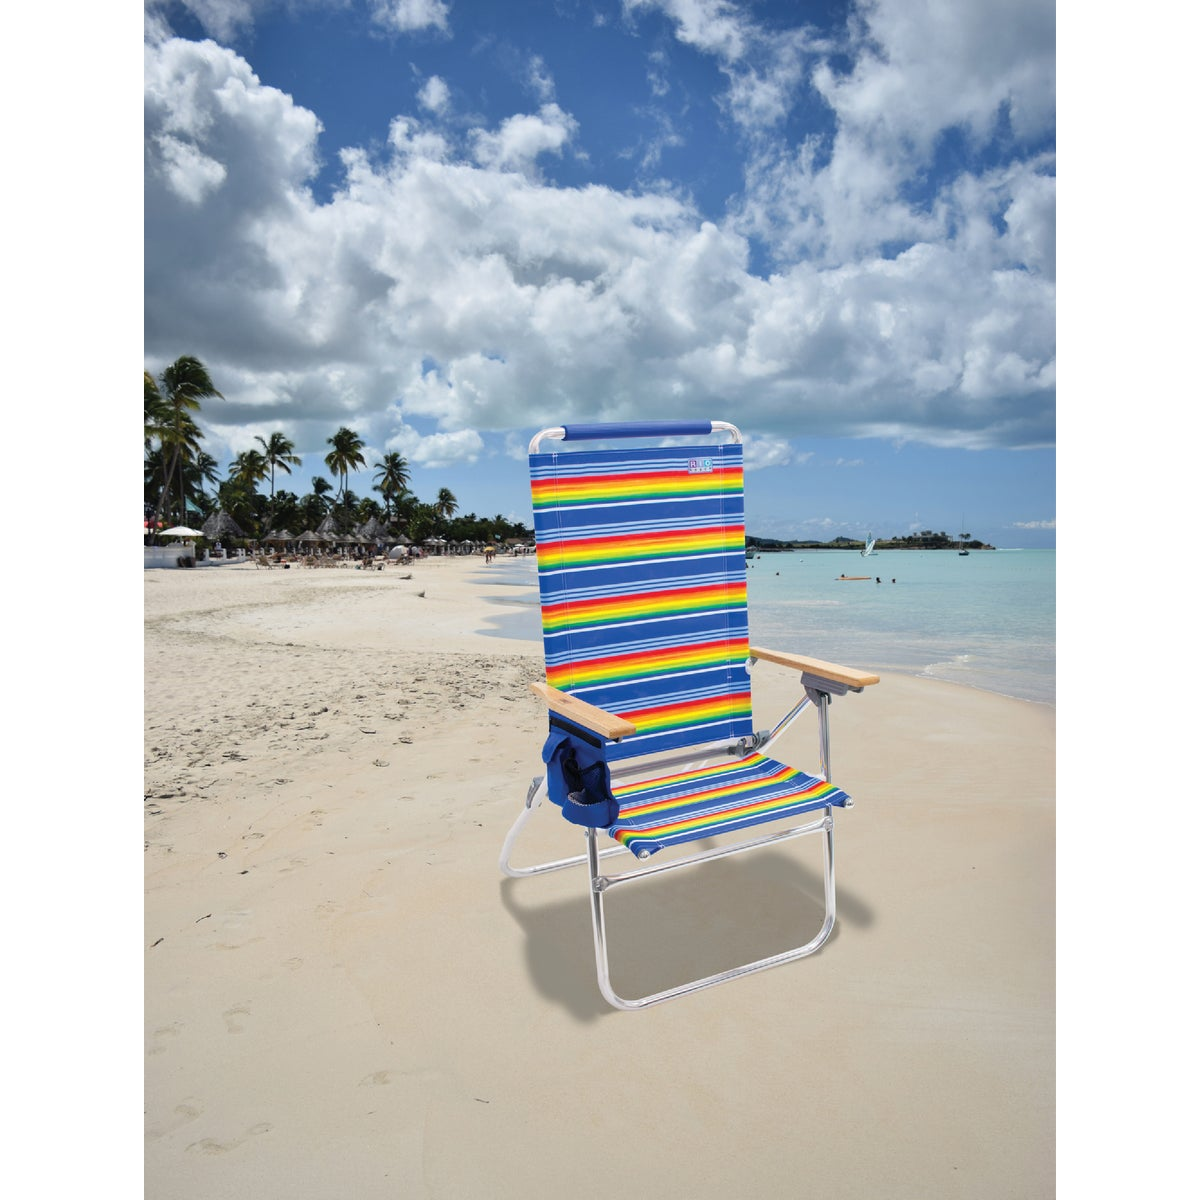 Rio Brands-Chairs HI-BOY BACKYARD CHAIR SC642-1012